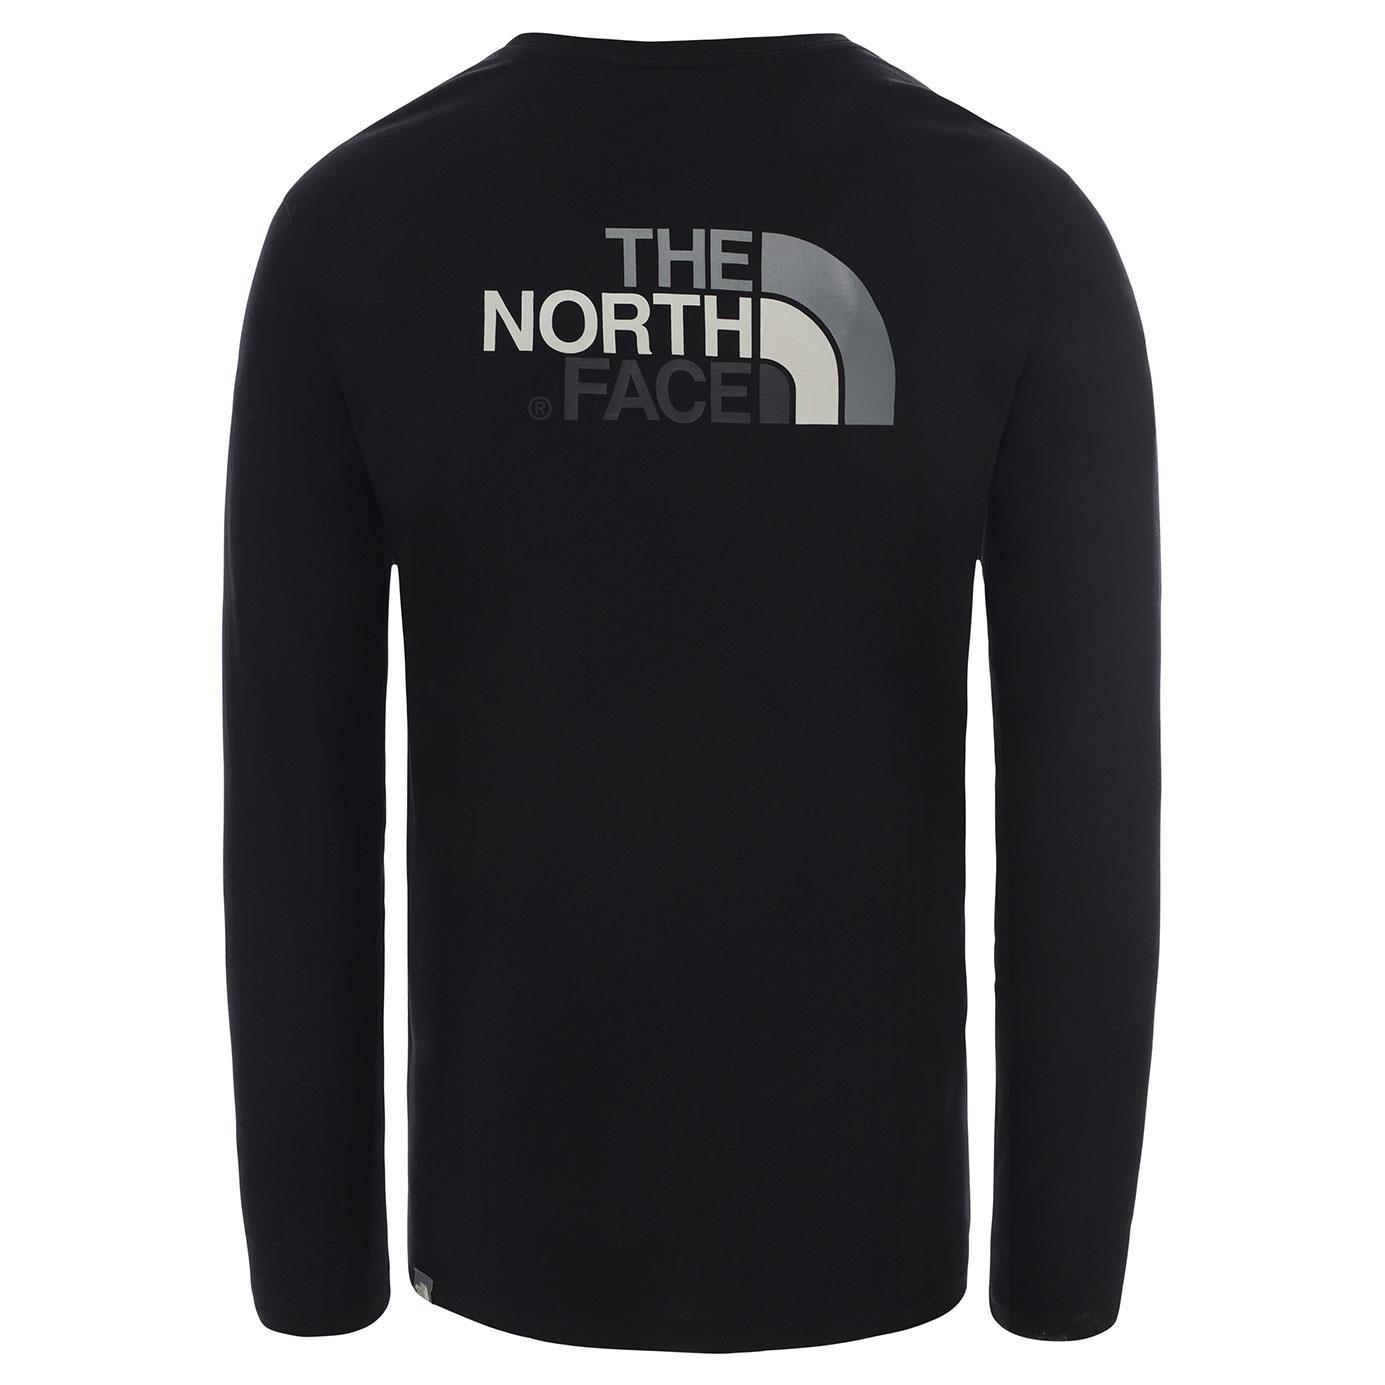 The Northface Erkek L/S EASY TEE - EU NF0A2TX1KZ21